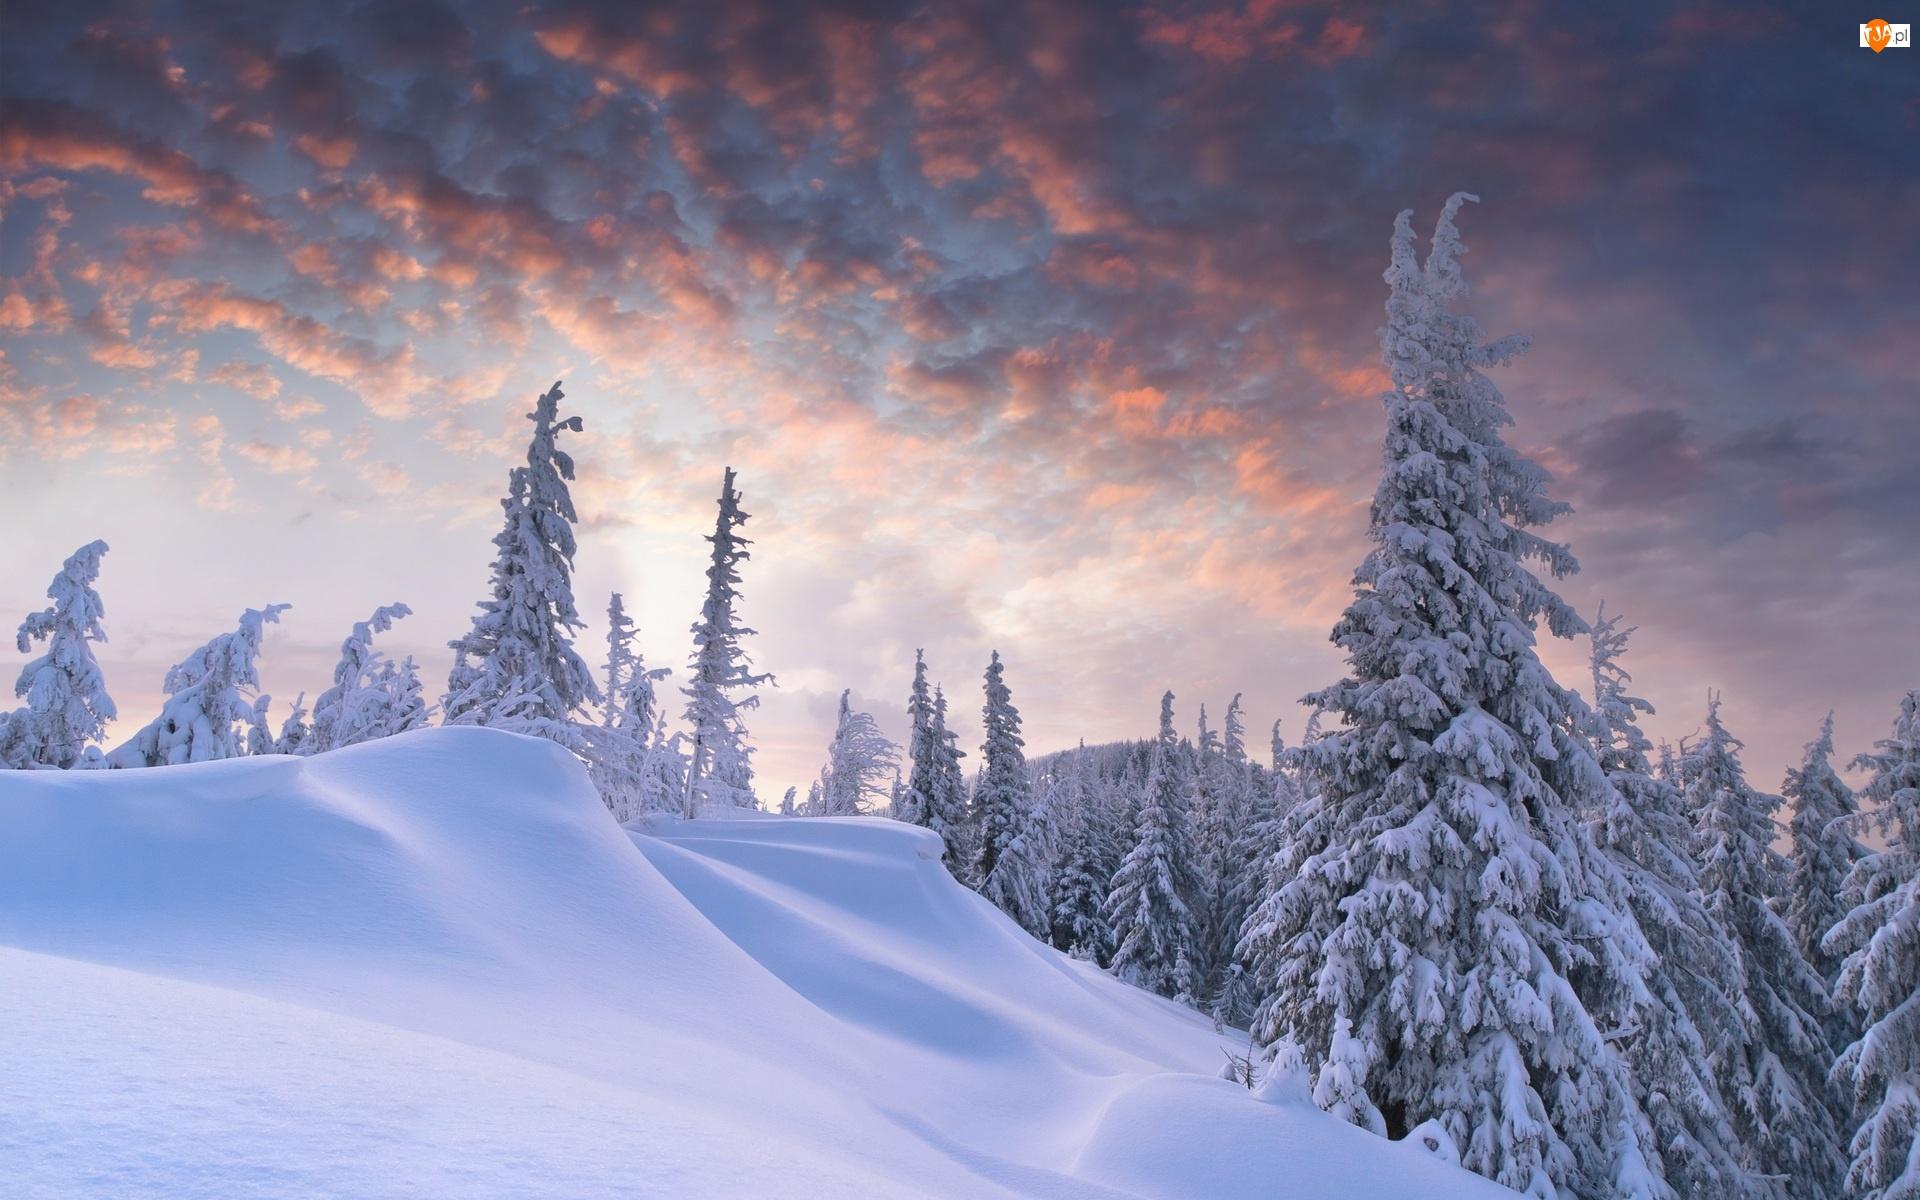 Chmury, Zima, Las, Śnieg